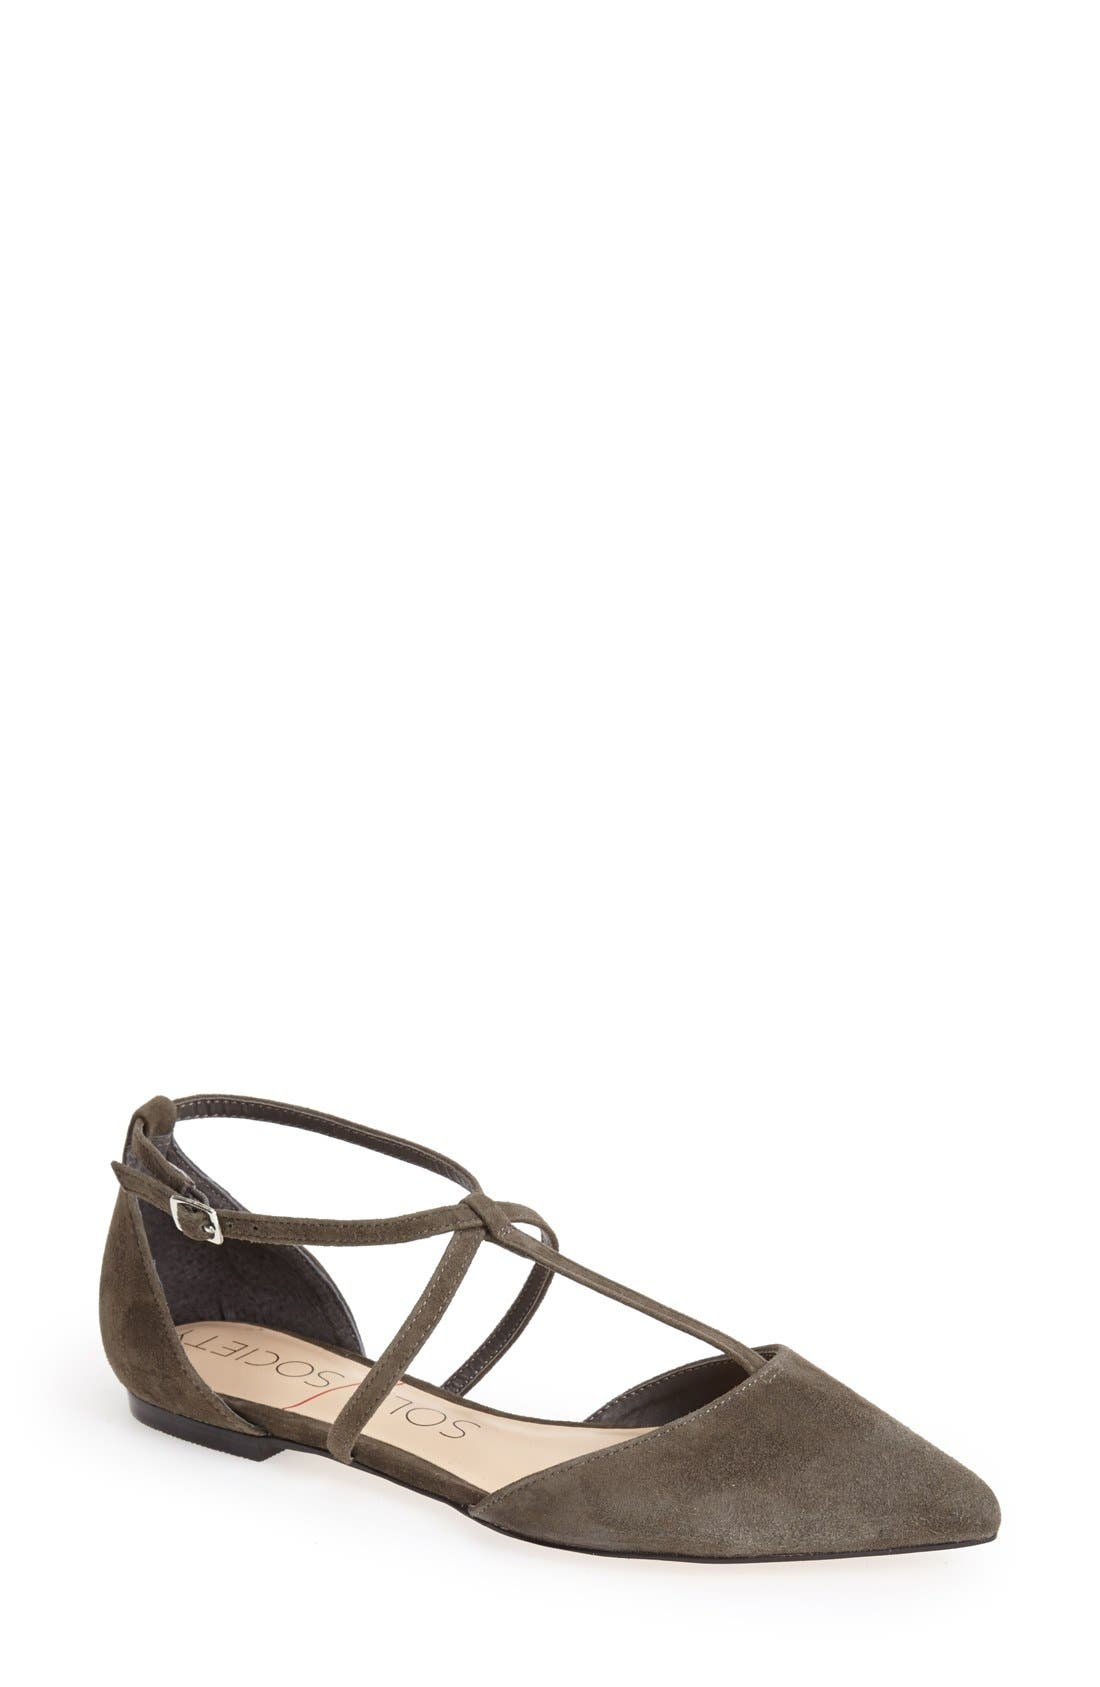 Main Image - Sole Society 'Chandler' Pointy Toe Flat (Women)